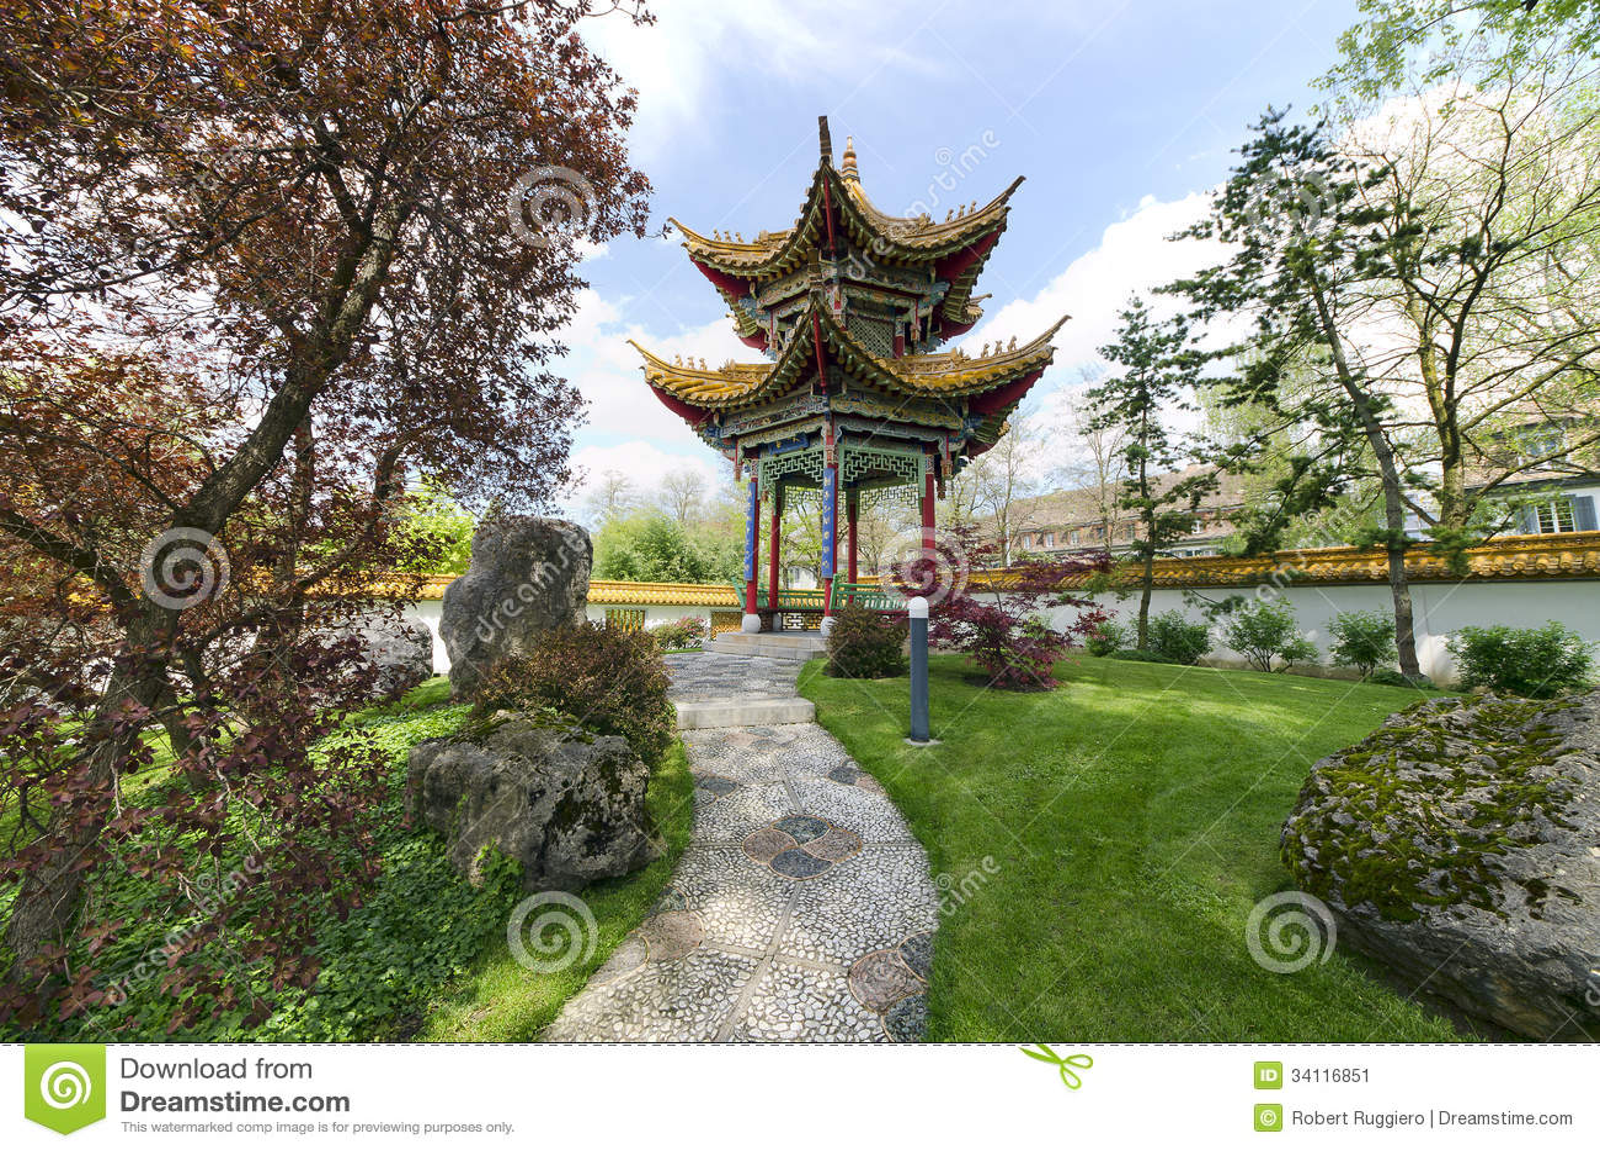 Giardino cinese a zurigo svizzera immagine stock for Giardino cinese